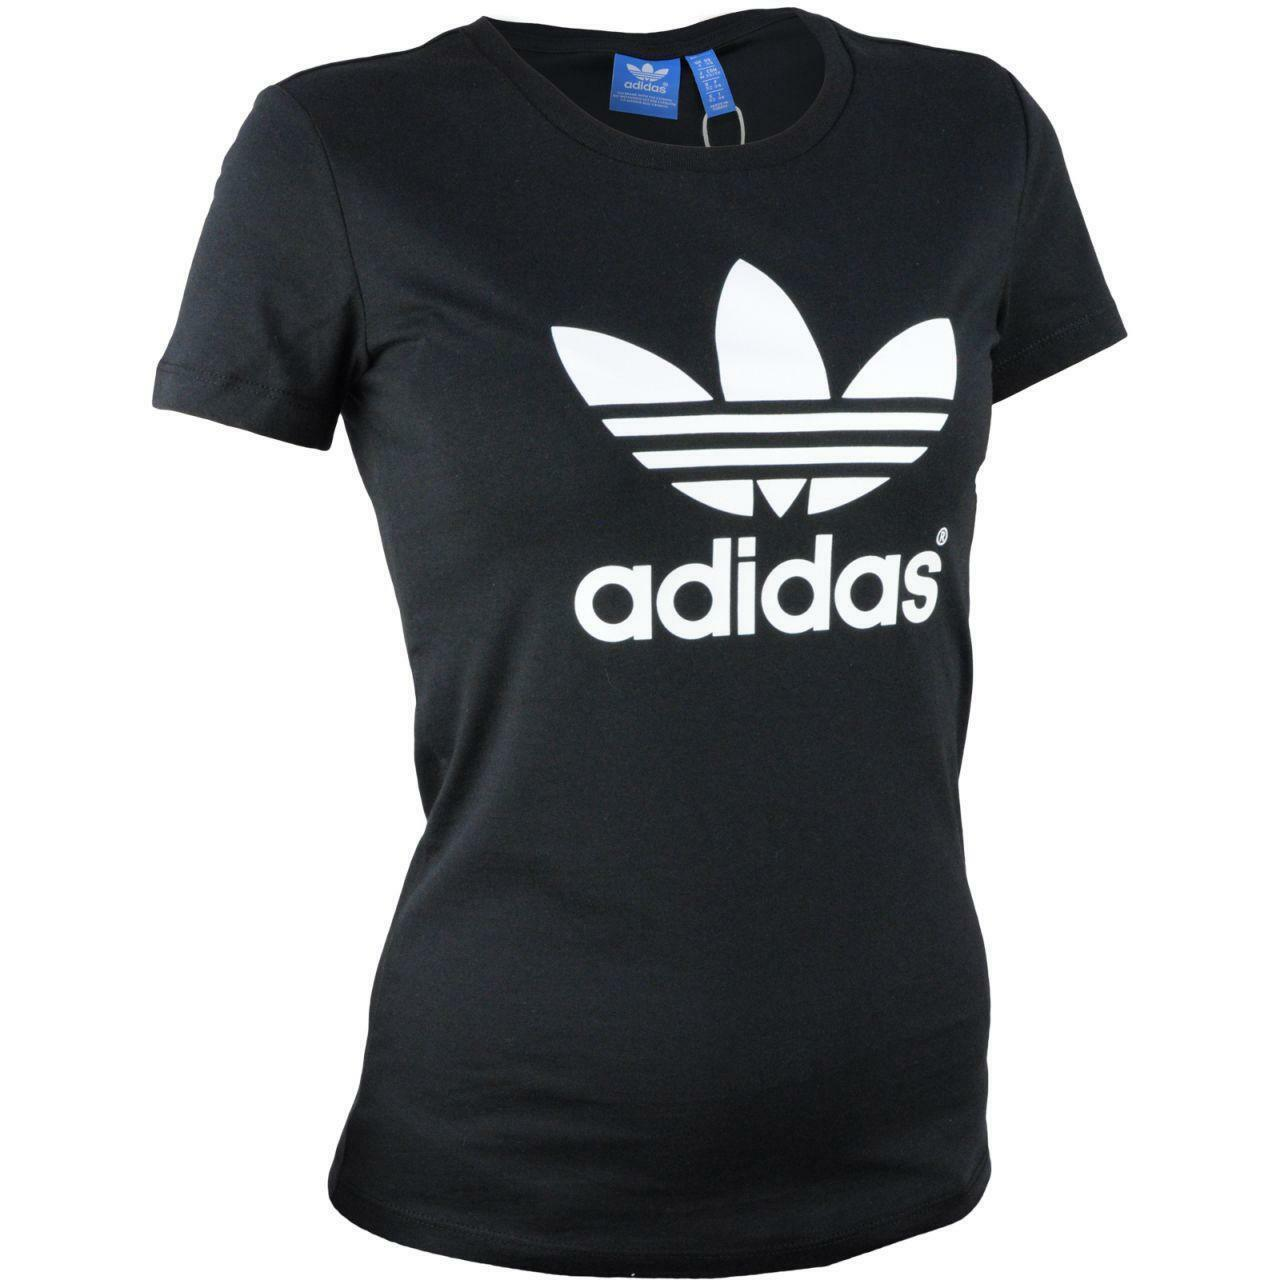 adidas adidas trefoil t-shirt donna nera 100% cotone aj8084